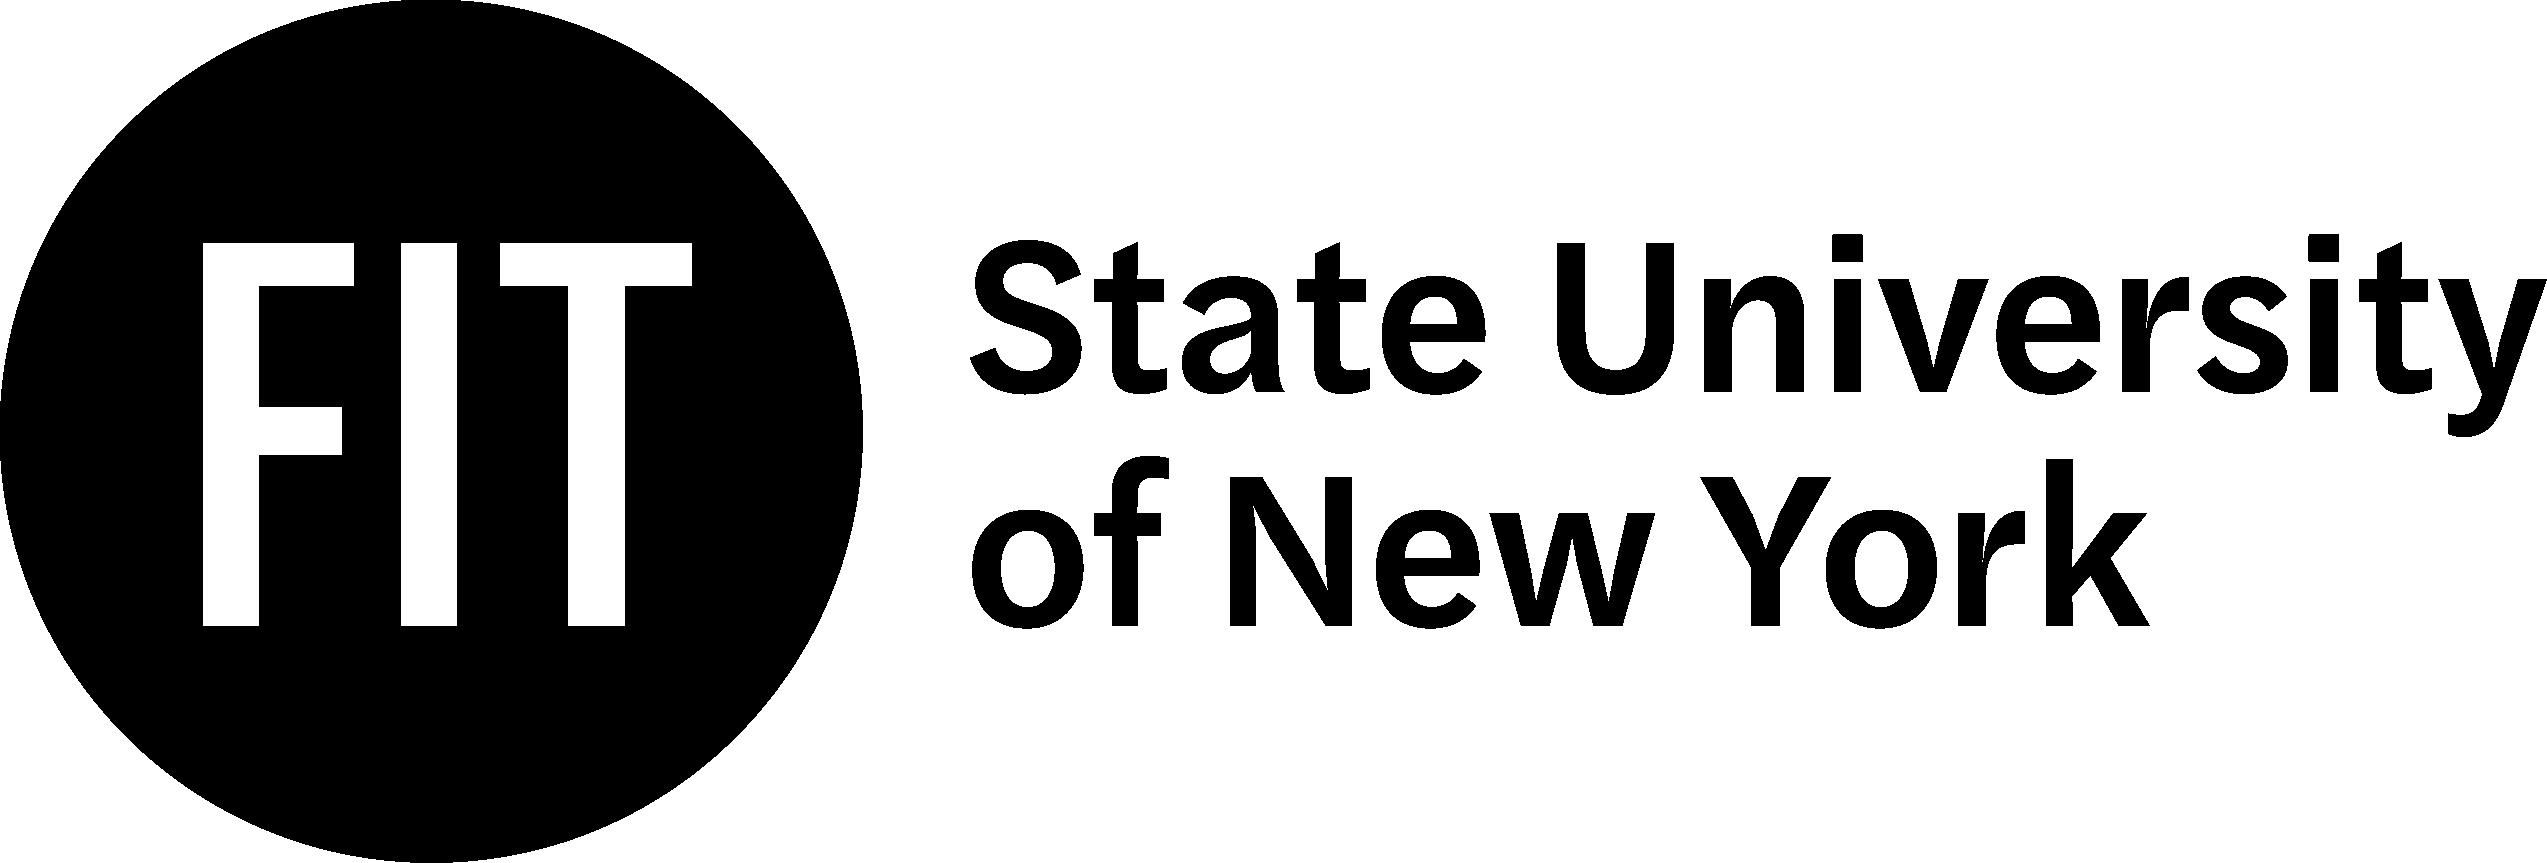 Web Logos.